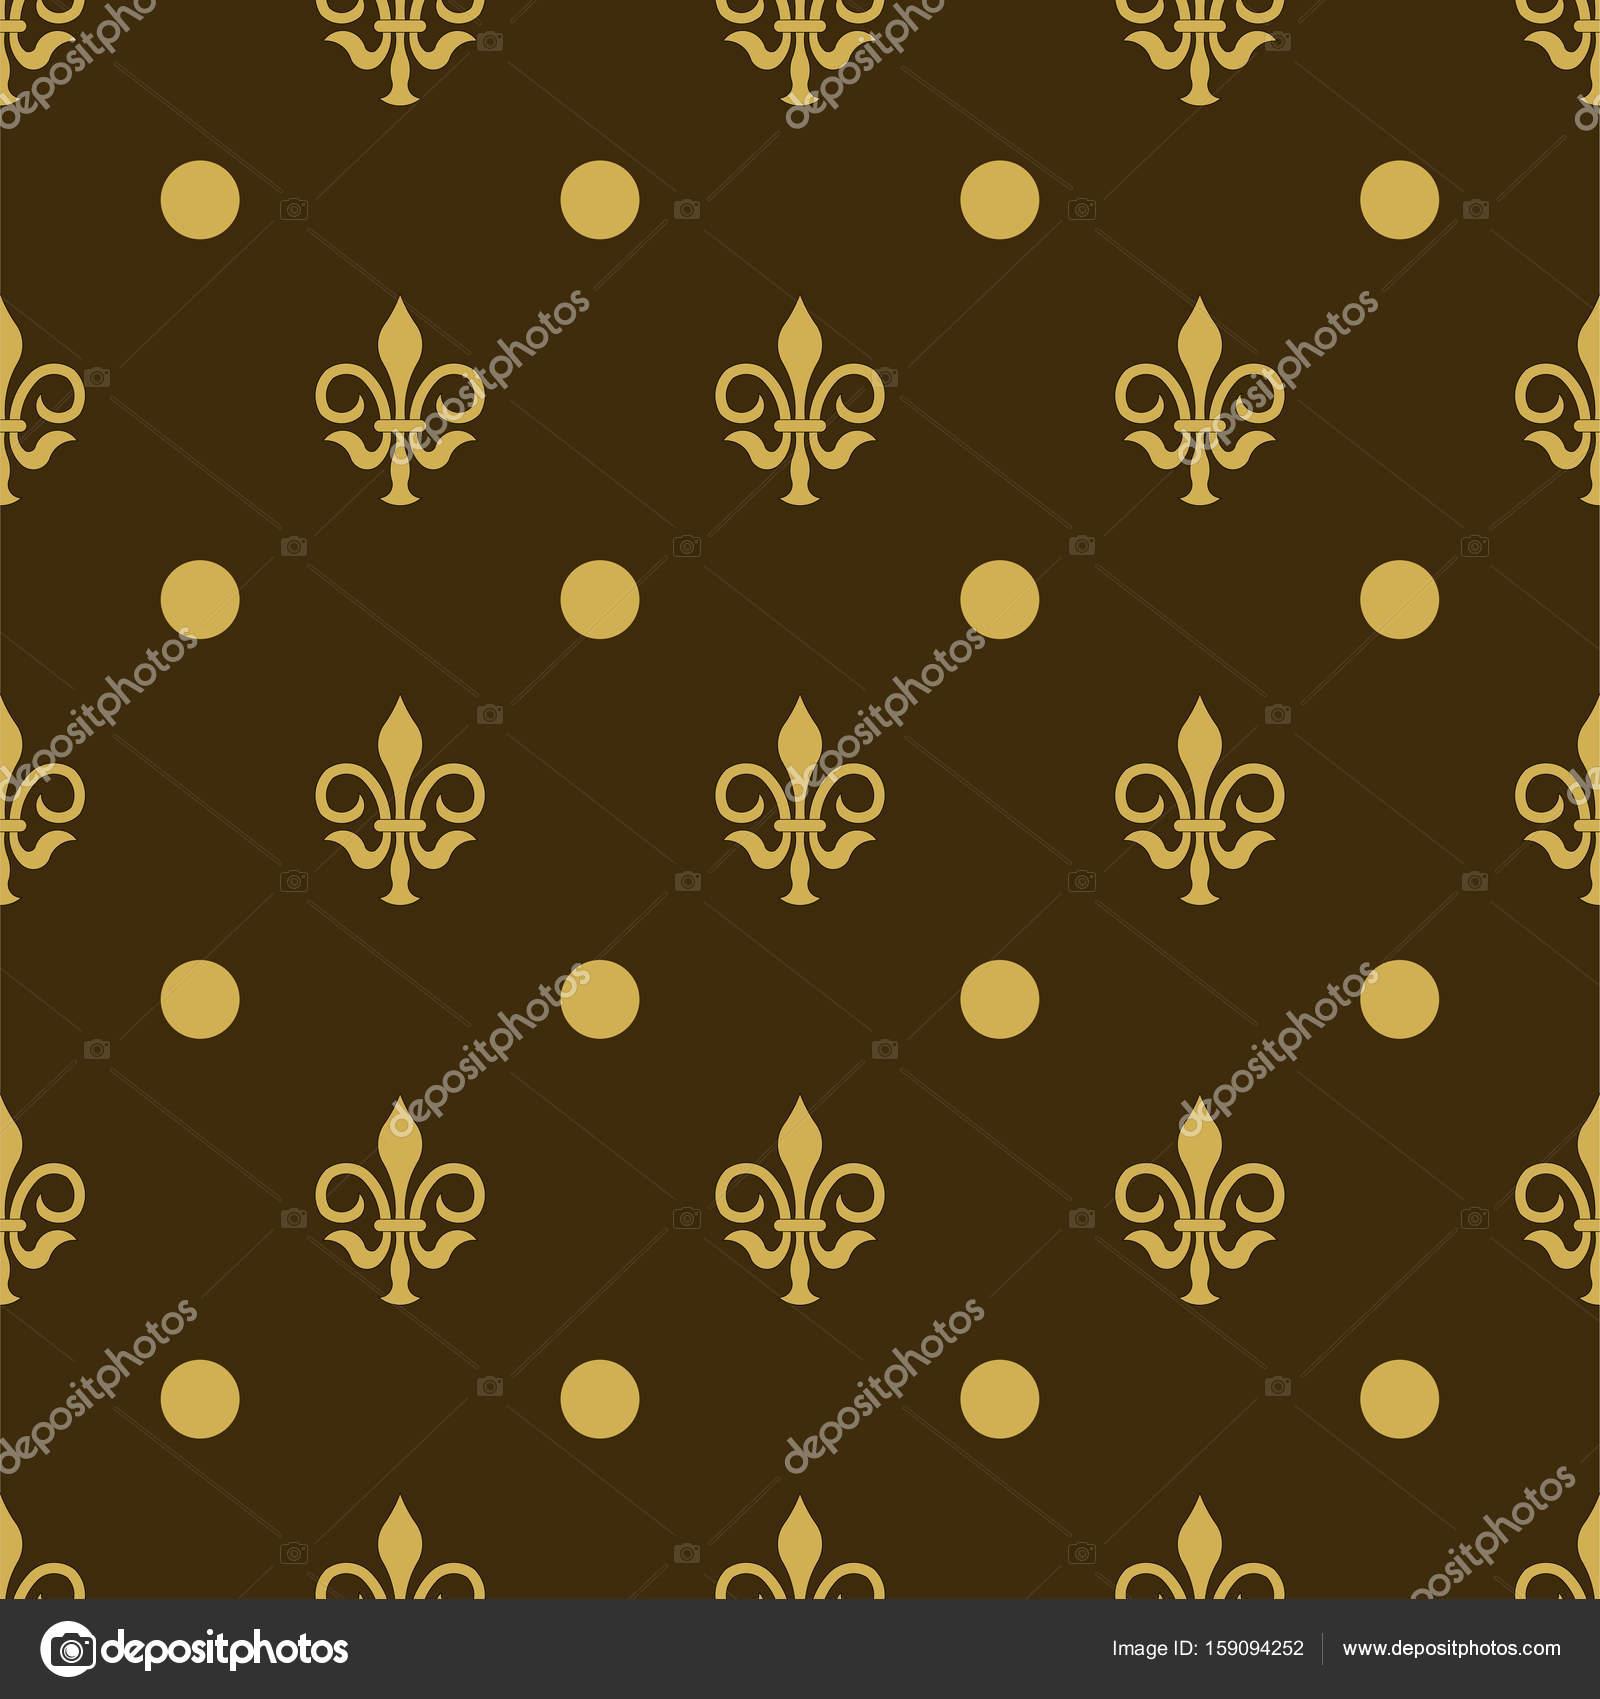 Seamless Texture Fleur De Lis Printing On Fabric Wallpaper Stock